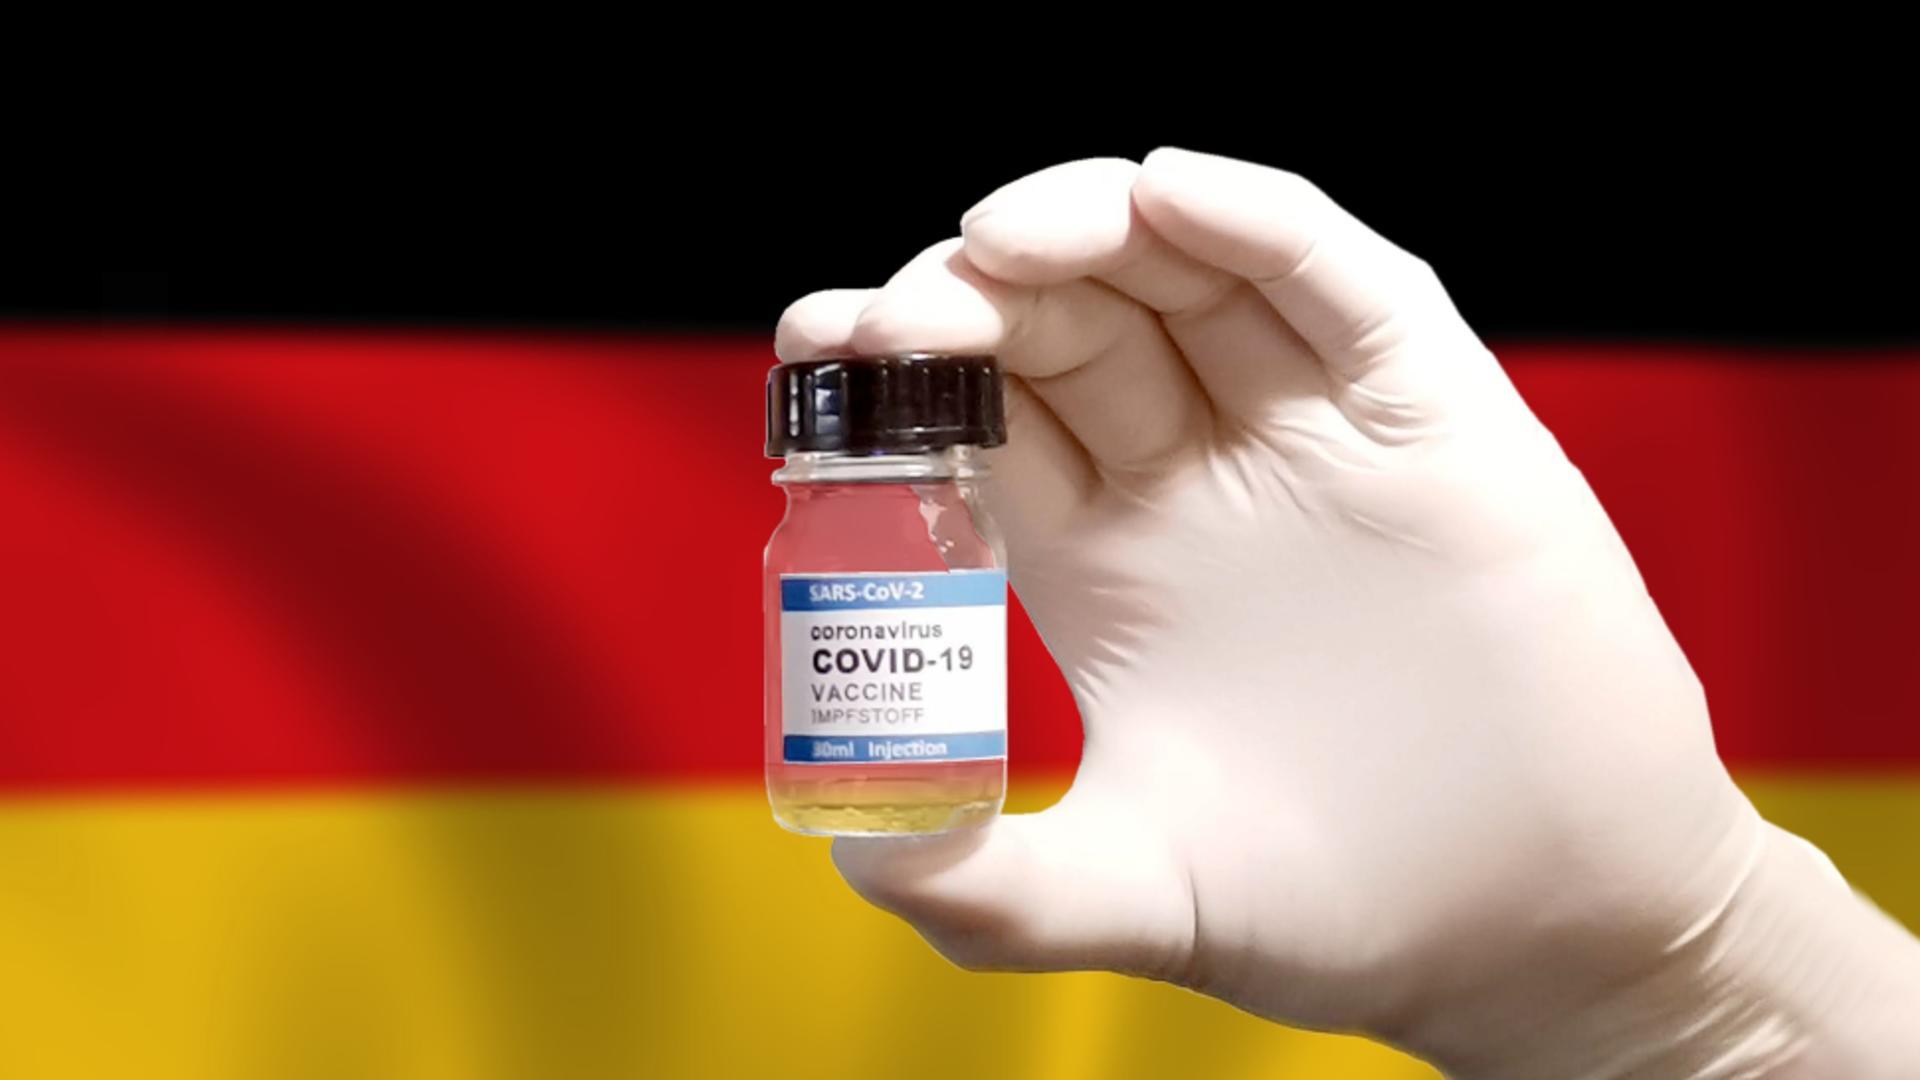 Solutie salina inn loc de vaccin/sursa foto: Pixabay